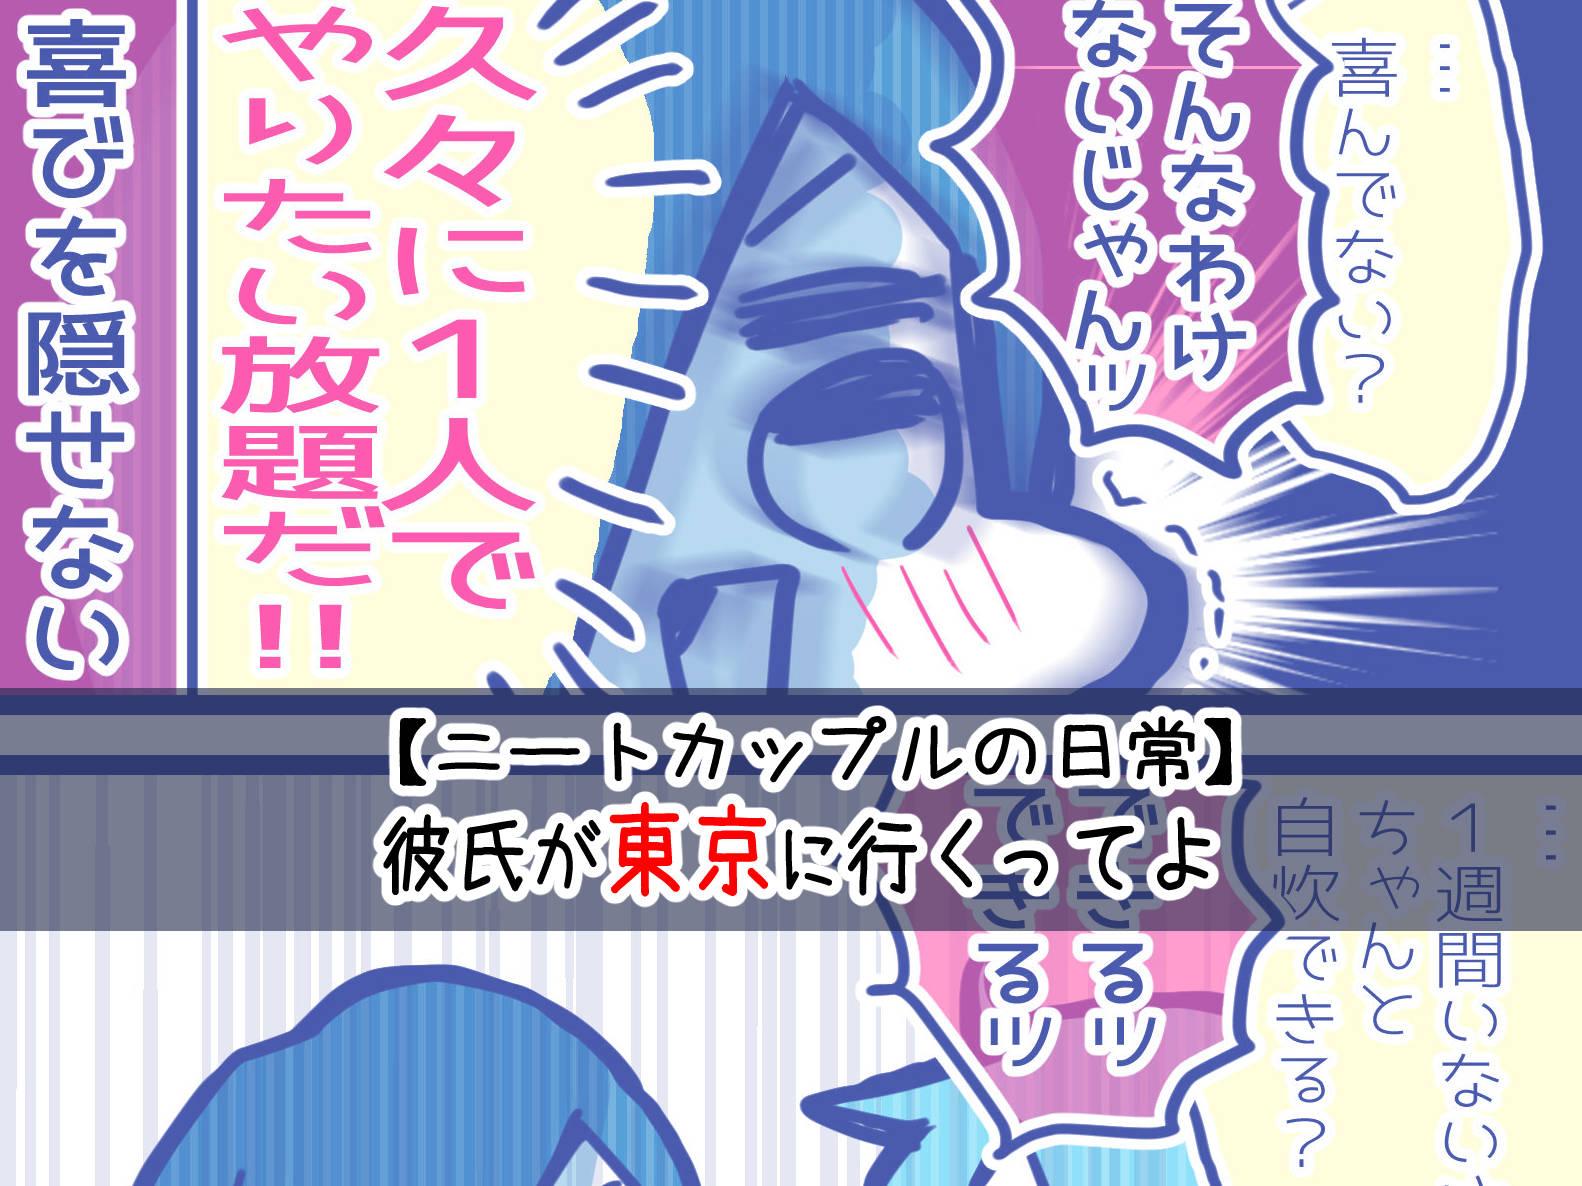 neetsadami.com_22話サムネ